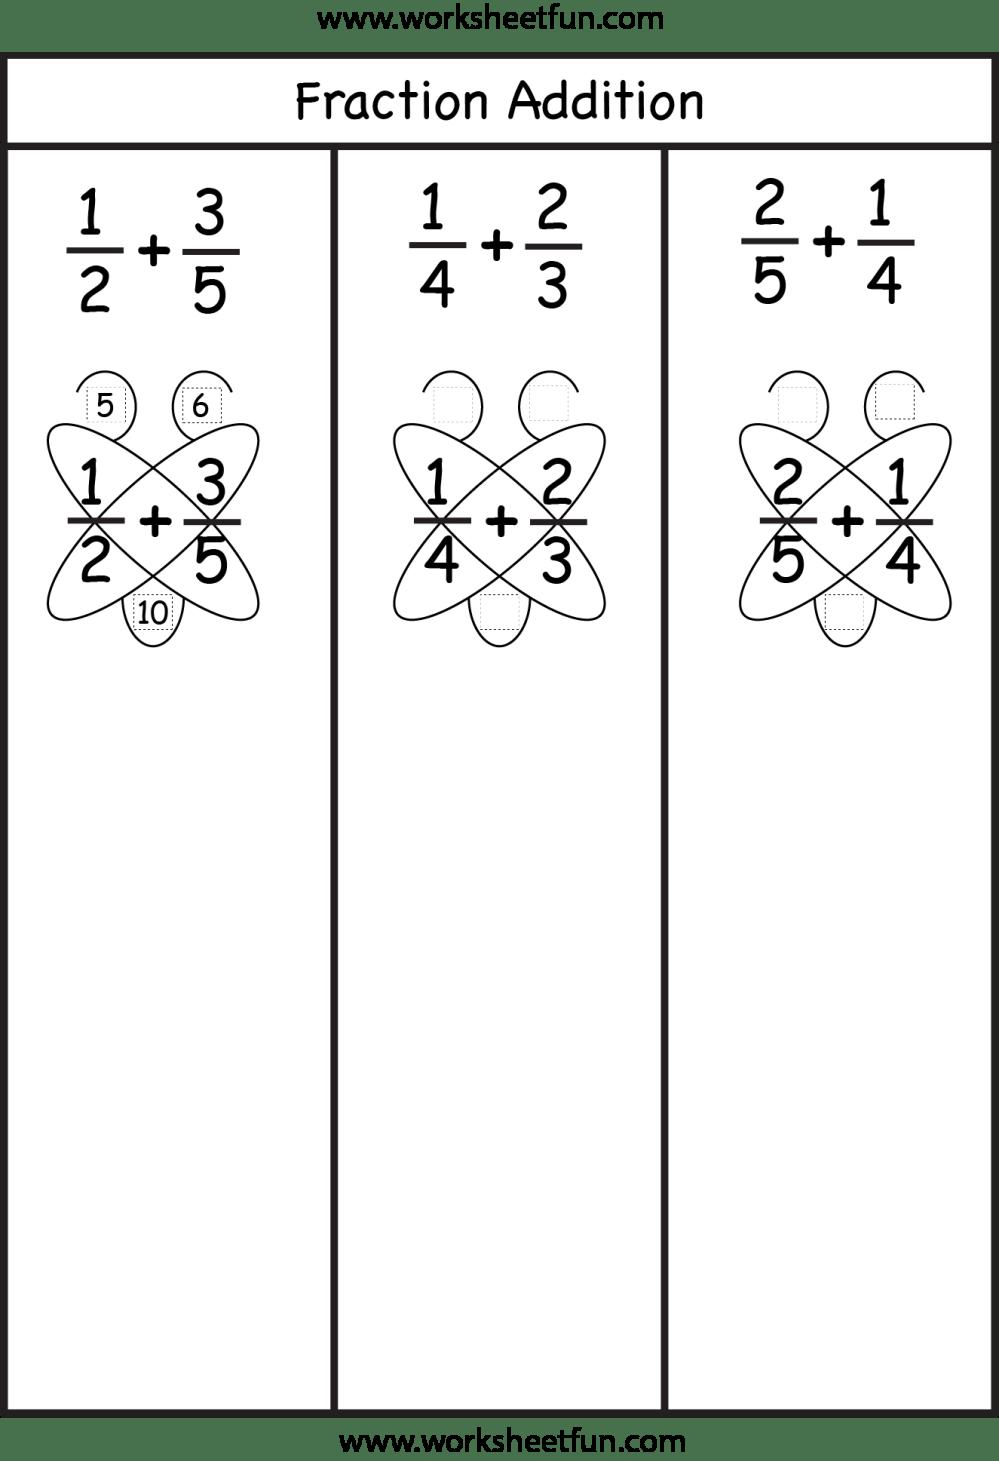 medium resolution of Fraction Addition – Butterfly Method / FREE Printable Worksheets –  Worksheetfun